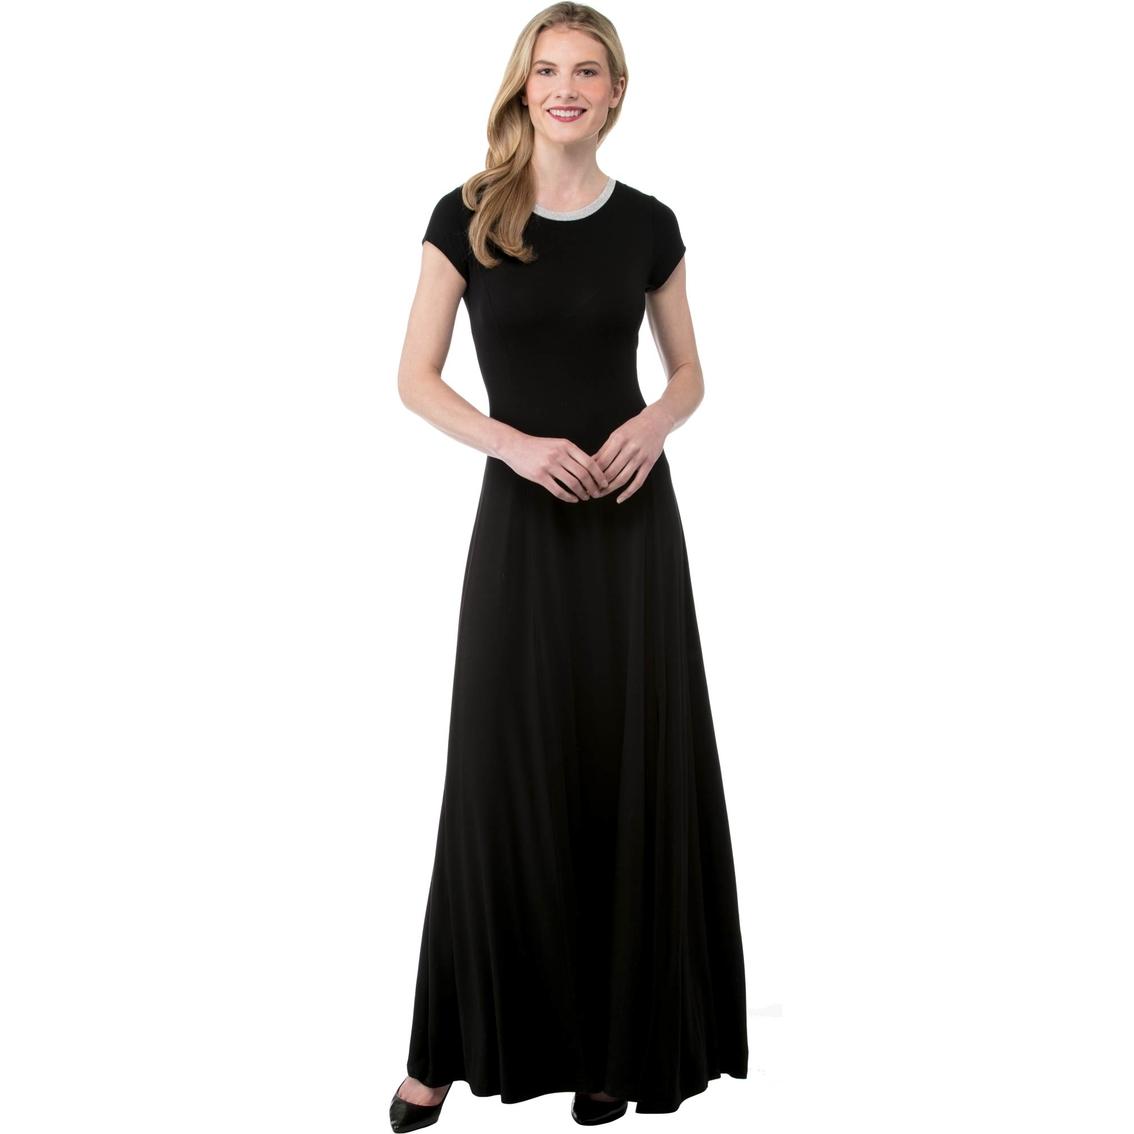 7fa7f971ac0 Michael Kors Petite Cap Sleeve Slit Maxi Dress